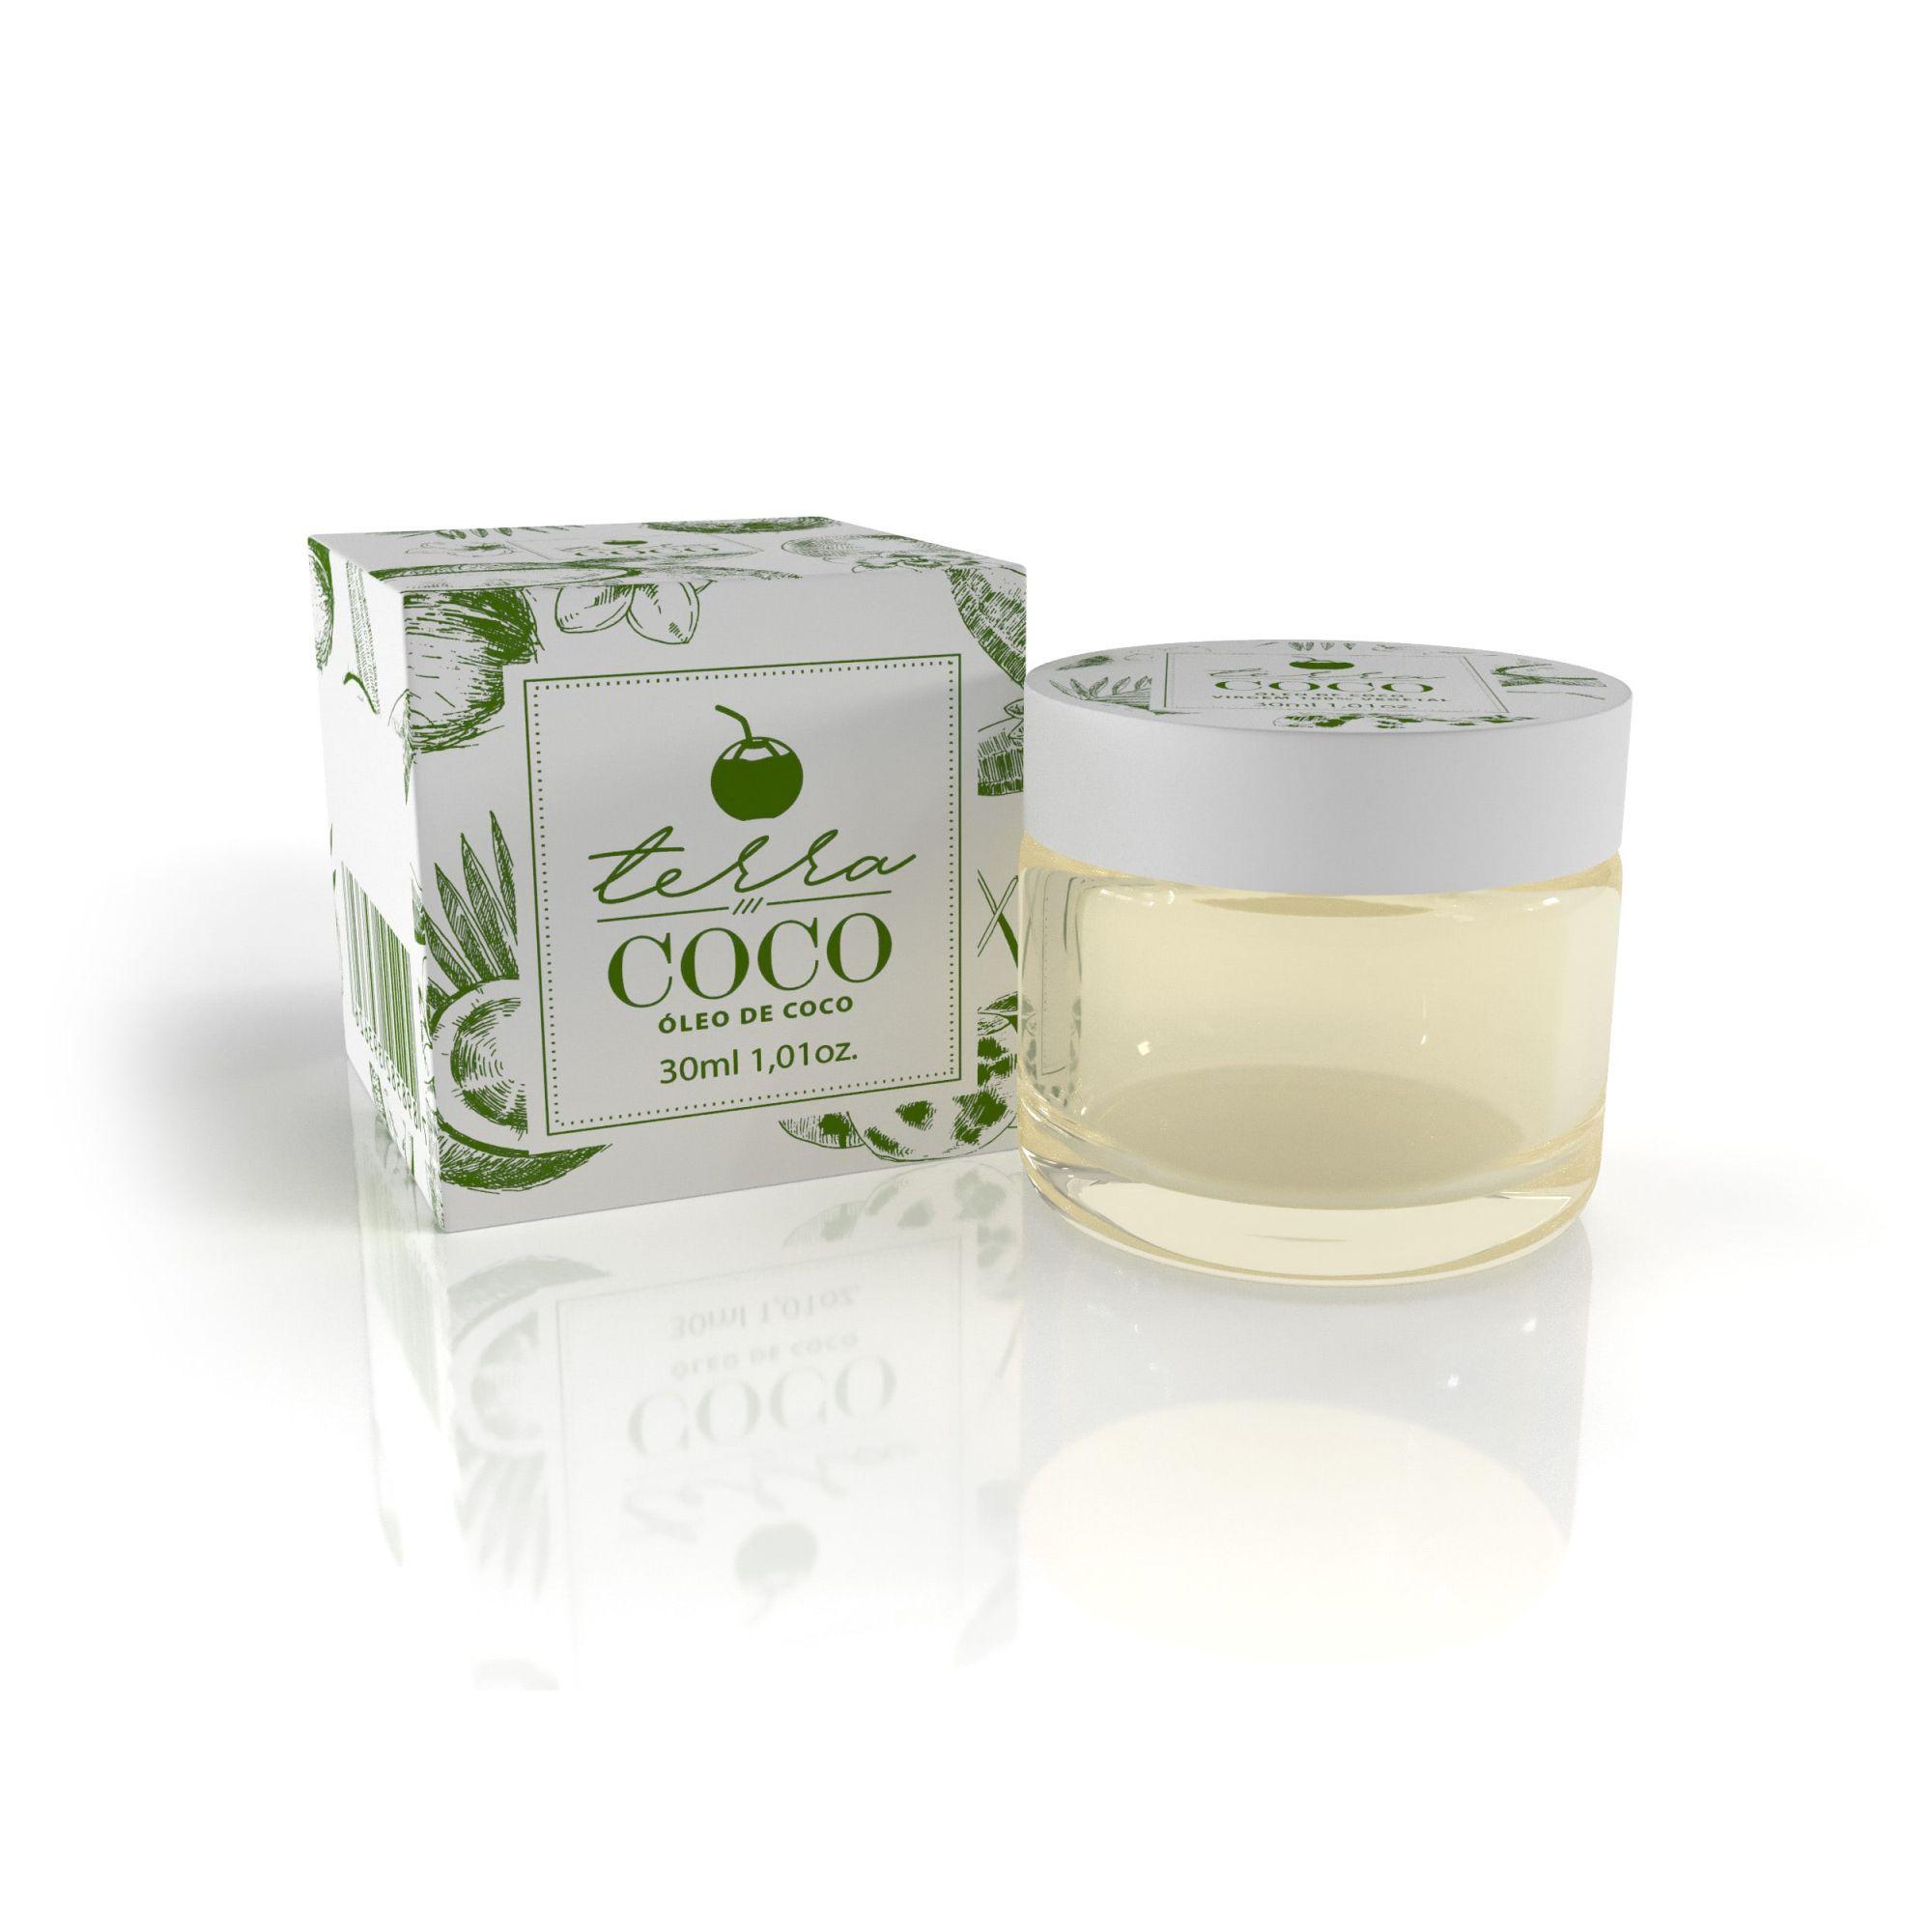 TERRA COCO - FINALIZADORES - OLEO DE COCO VIRGEM 100% VEGETAL 30ML